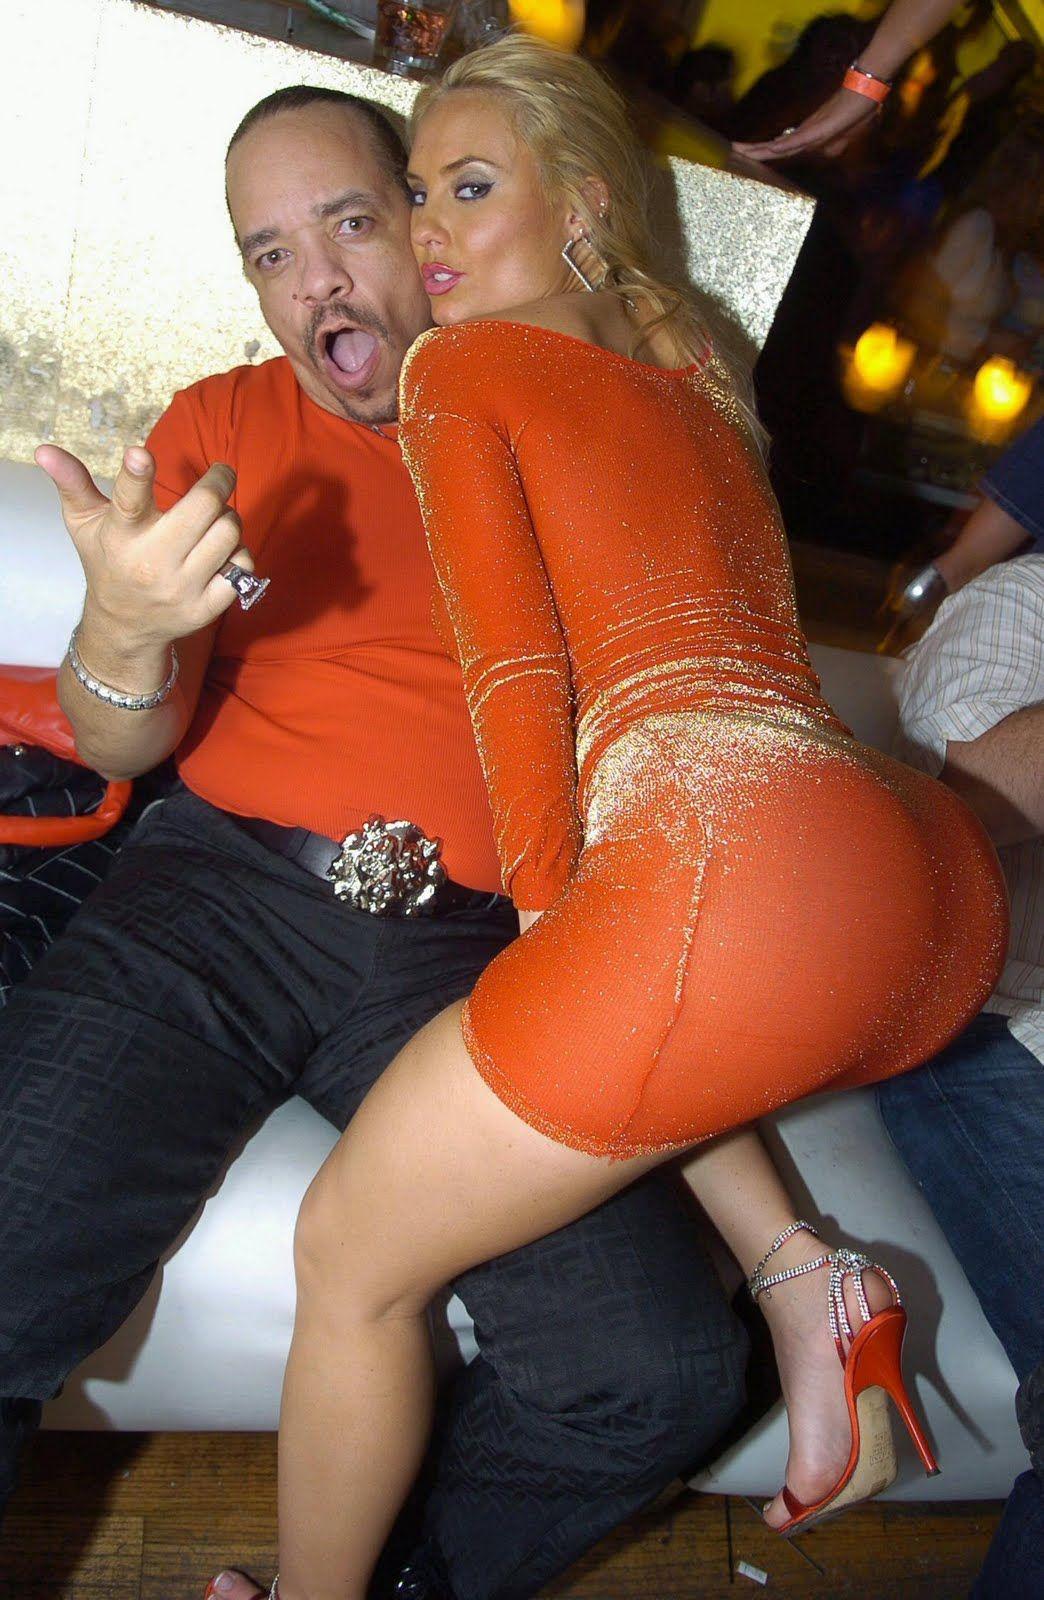 Nicole coco austin ass